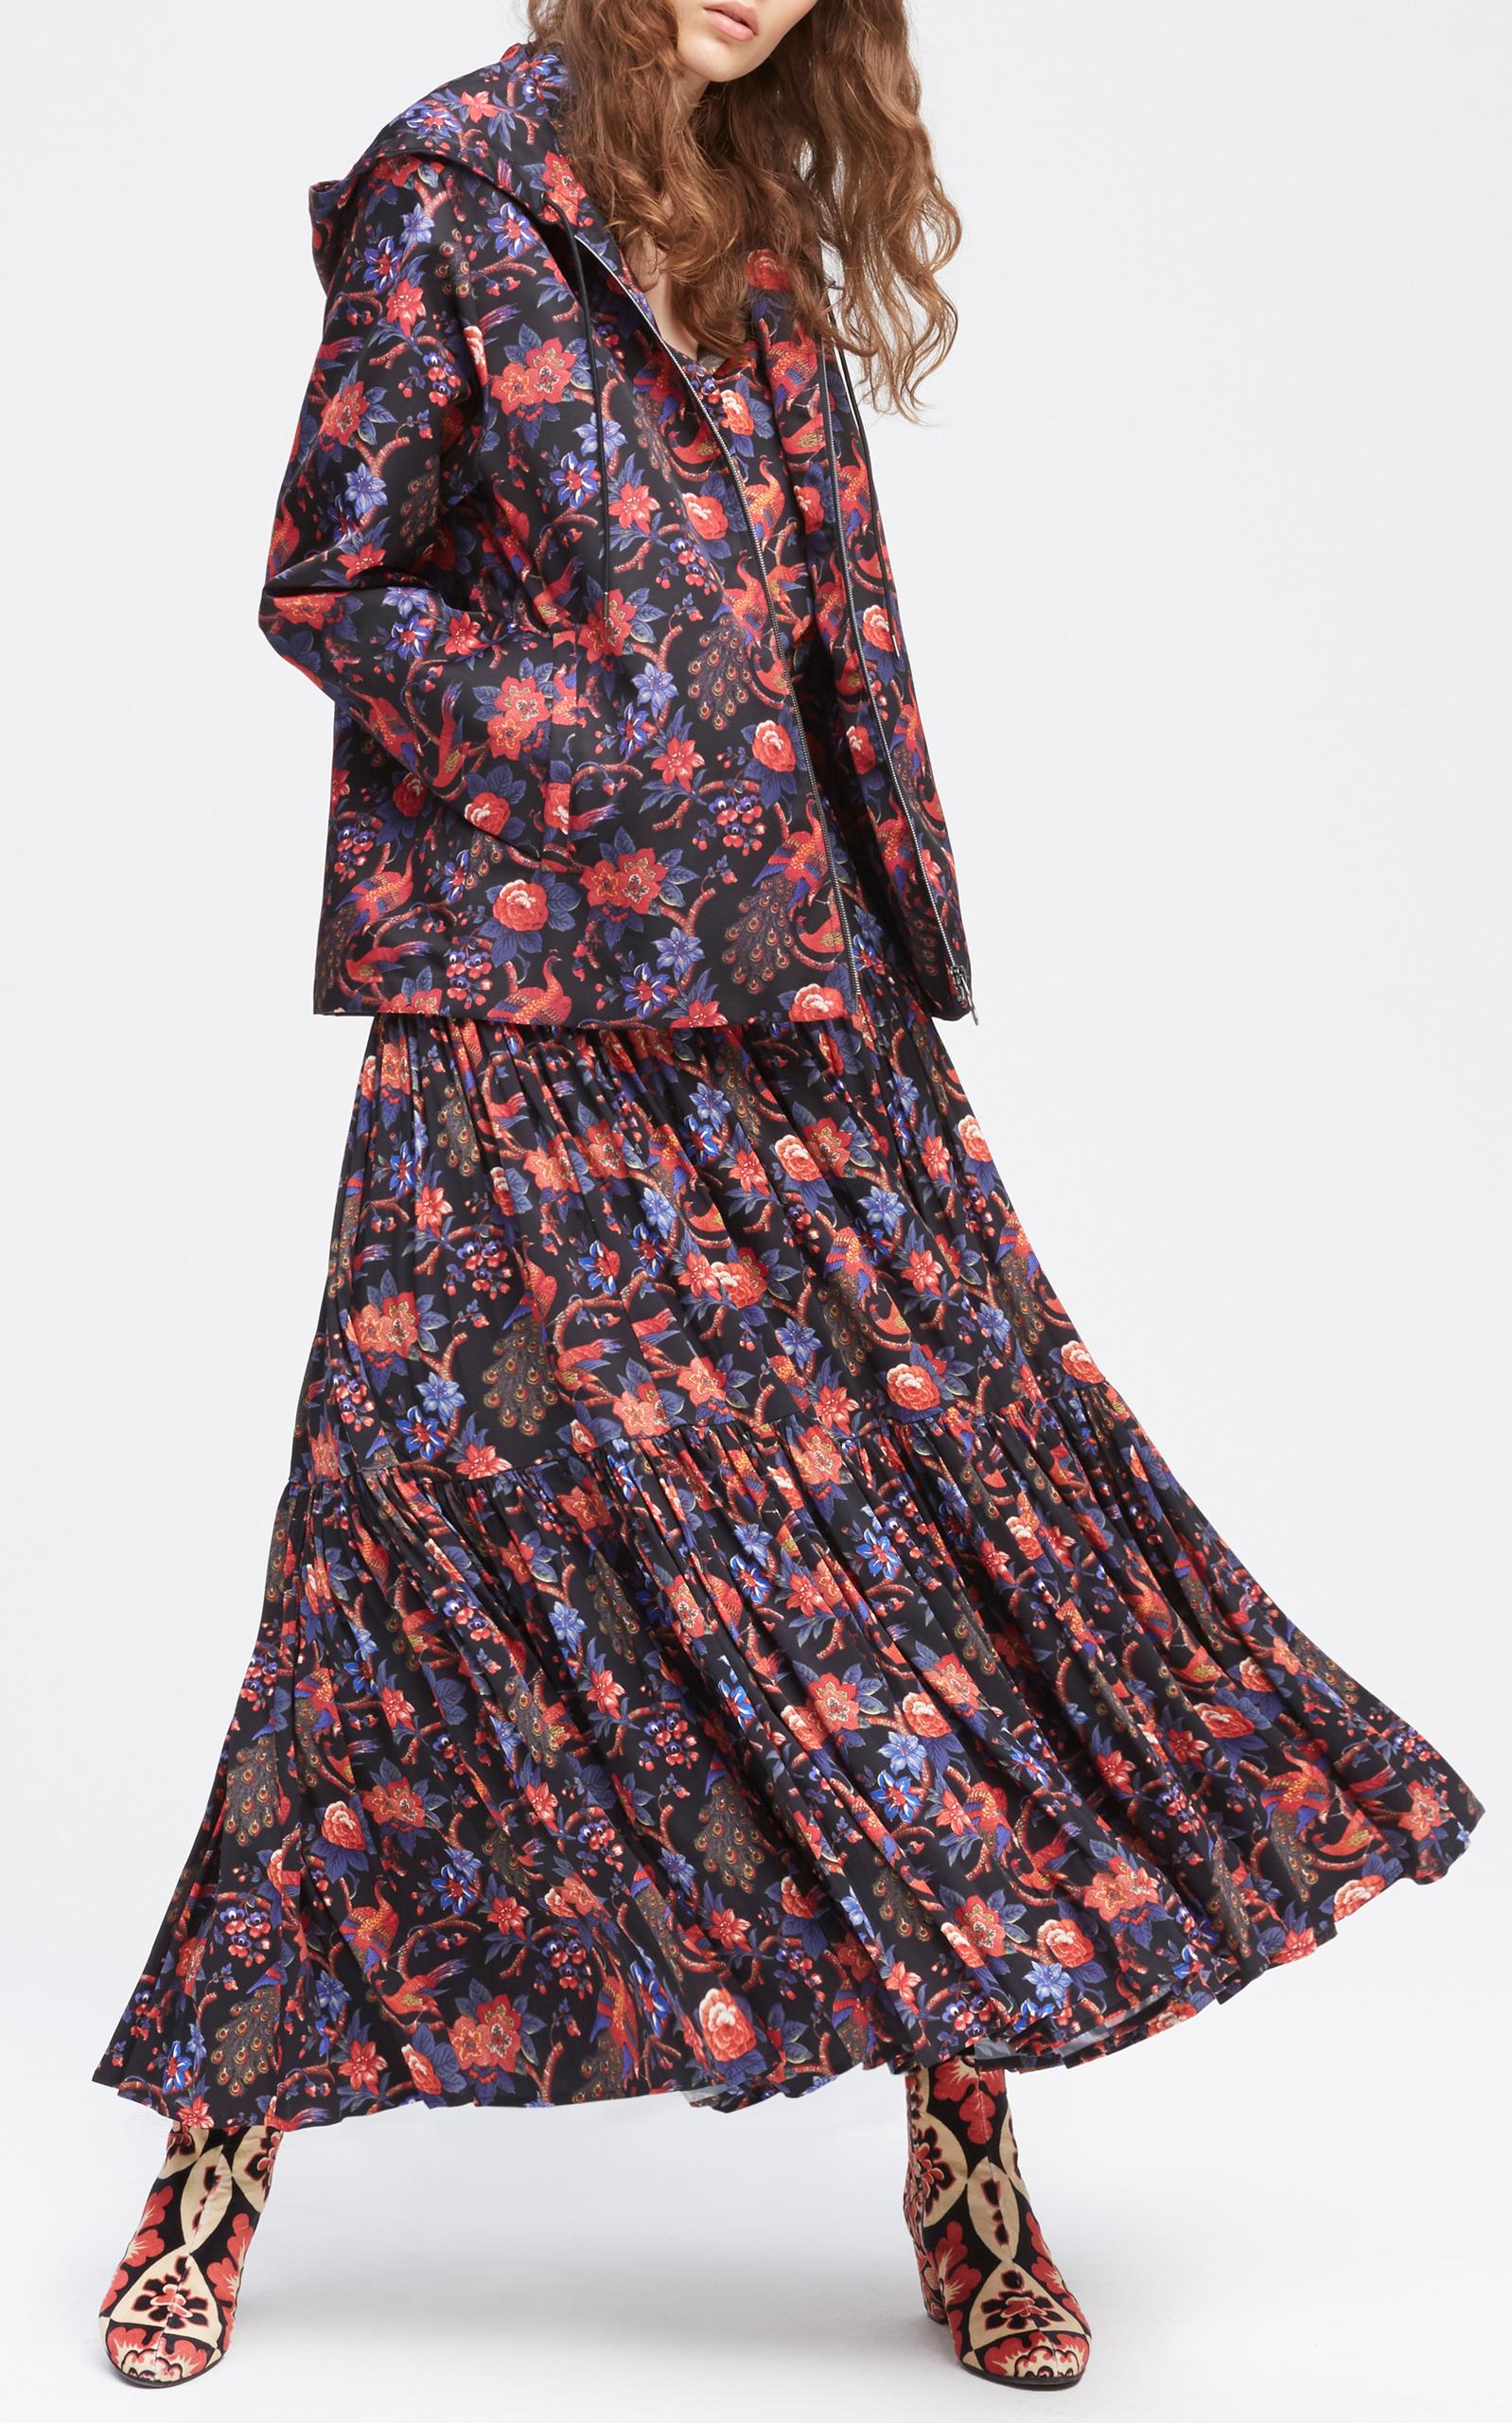 Printed Doublej Hood Jacket Windy La rxnzr4